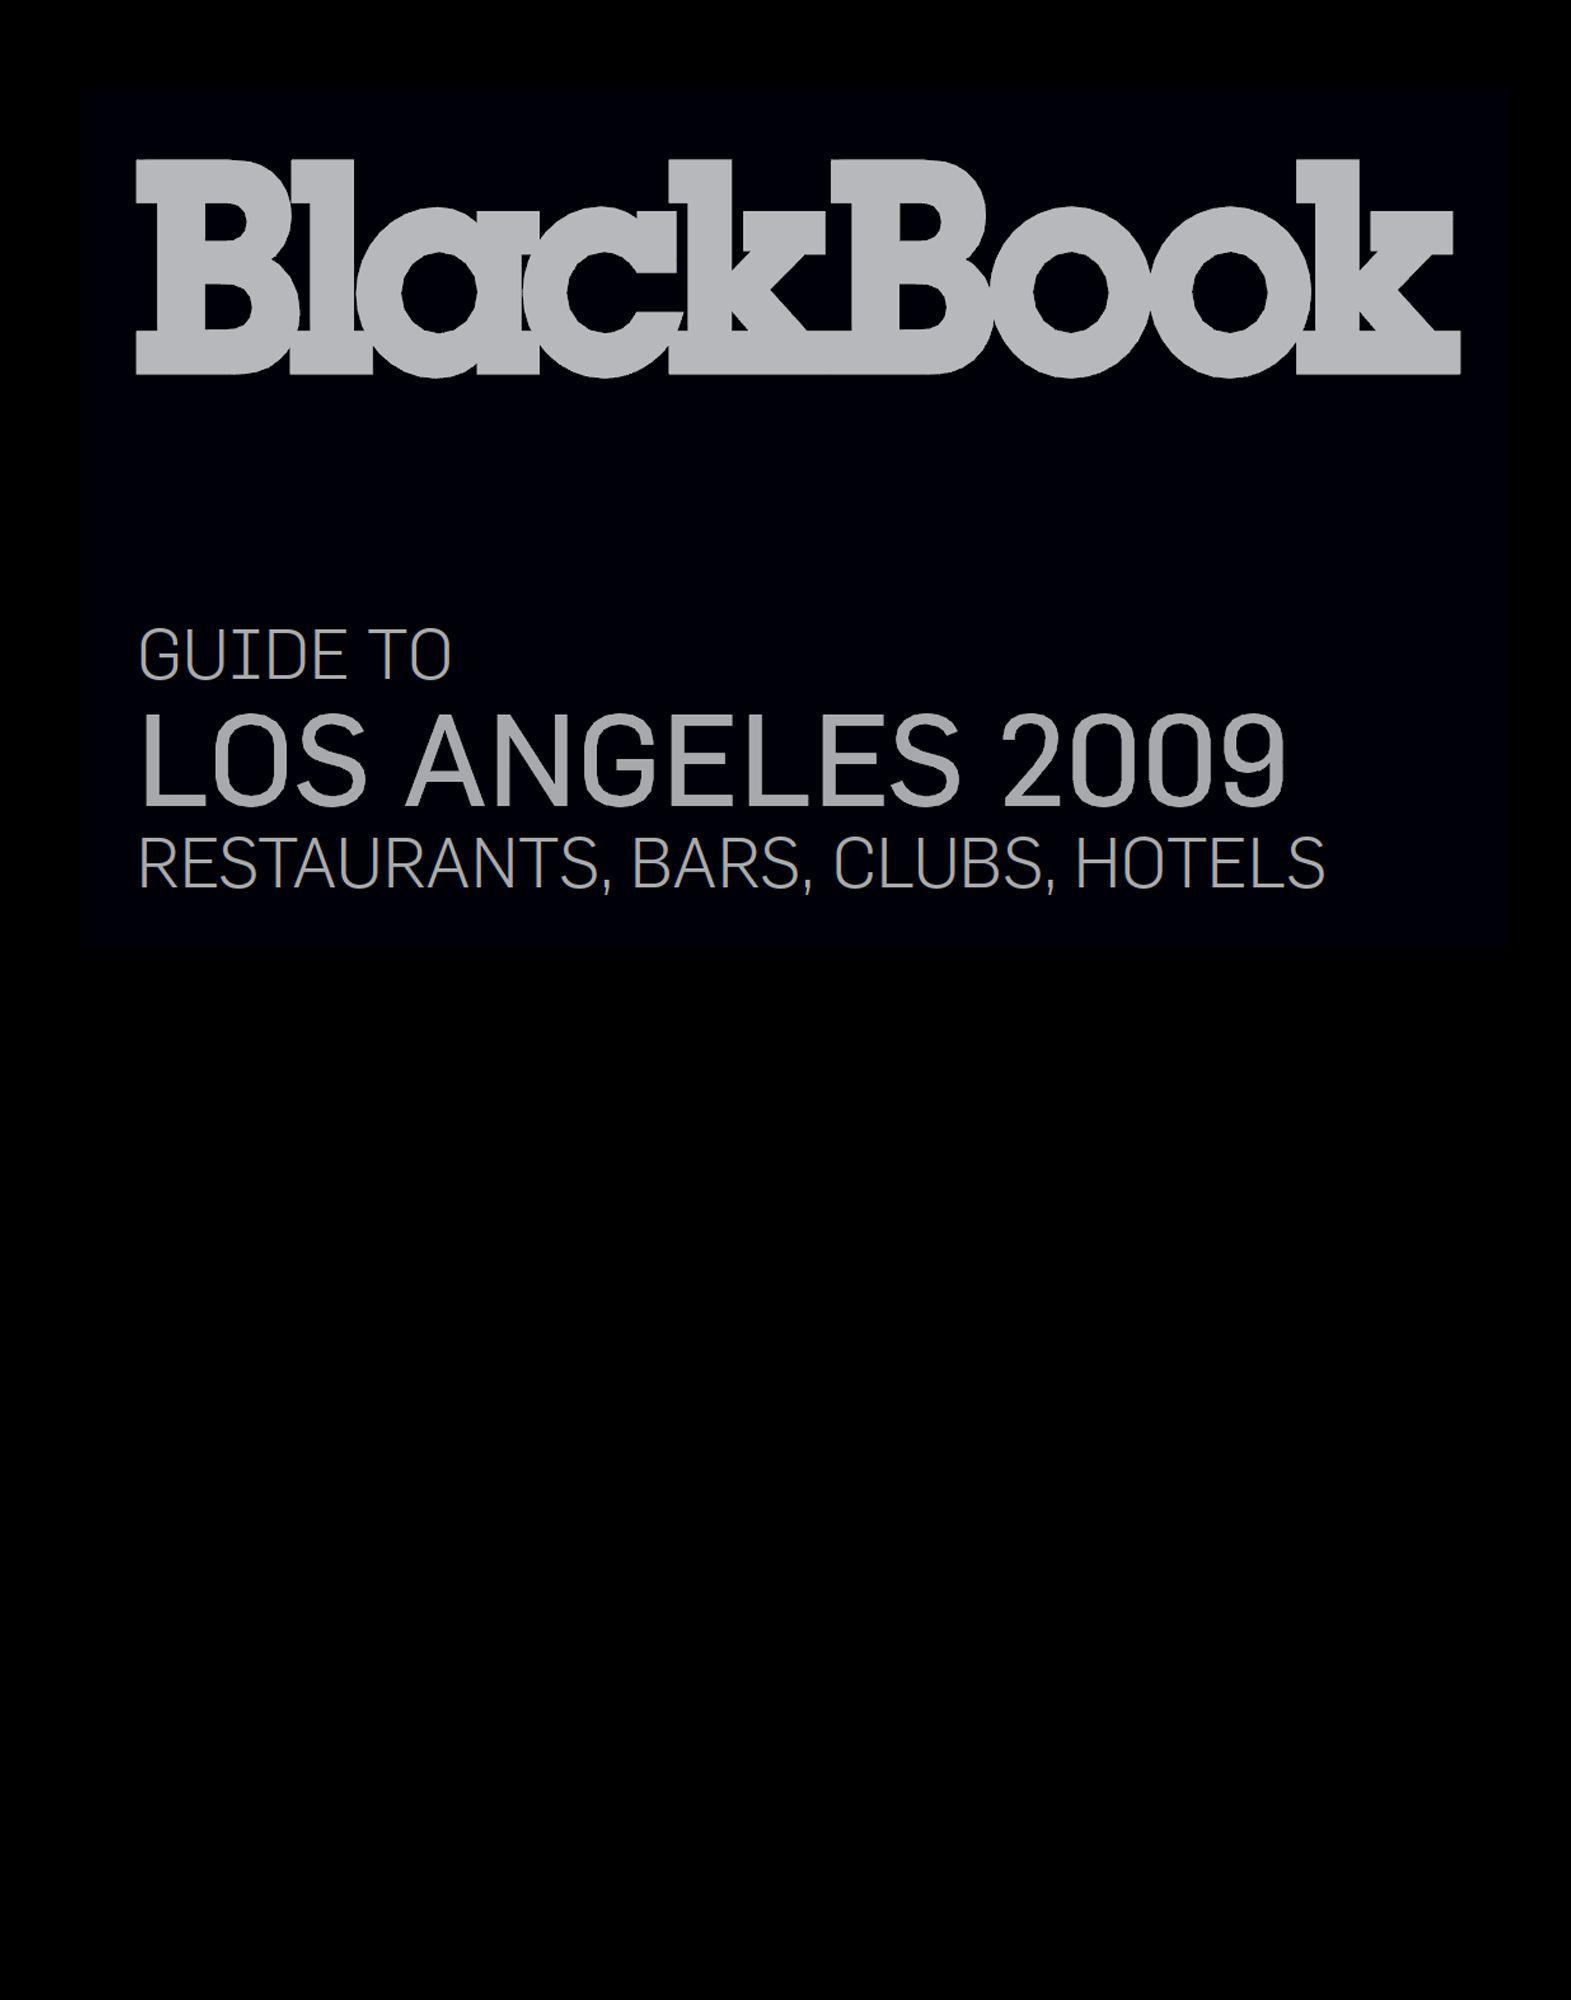 BLACKBOOK GUIDE LIFESTYLE  Item 56000505 1